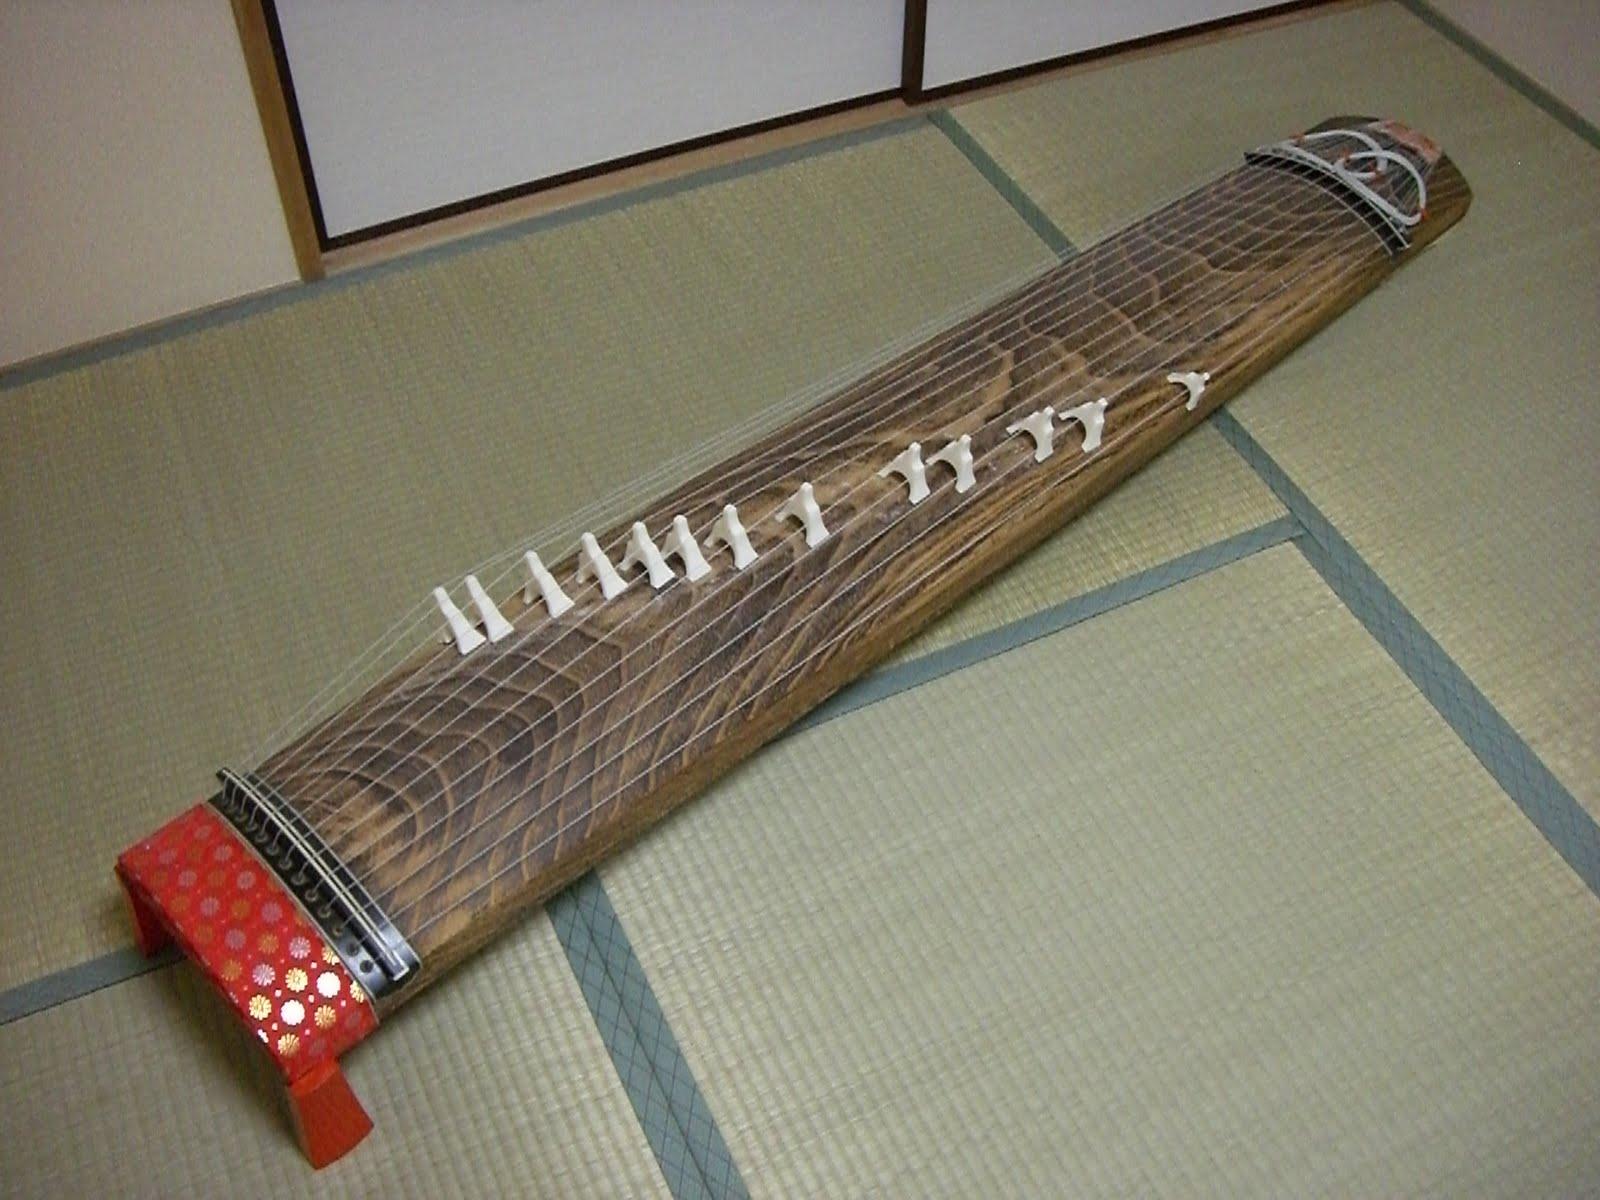 MUNDO JAPON: 1/08/11 - 1/09/11